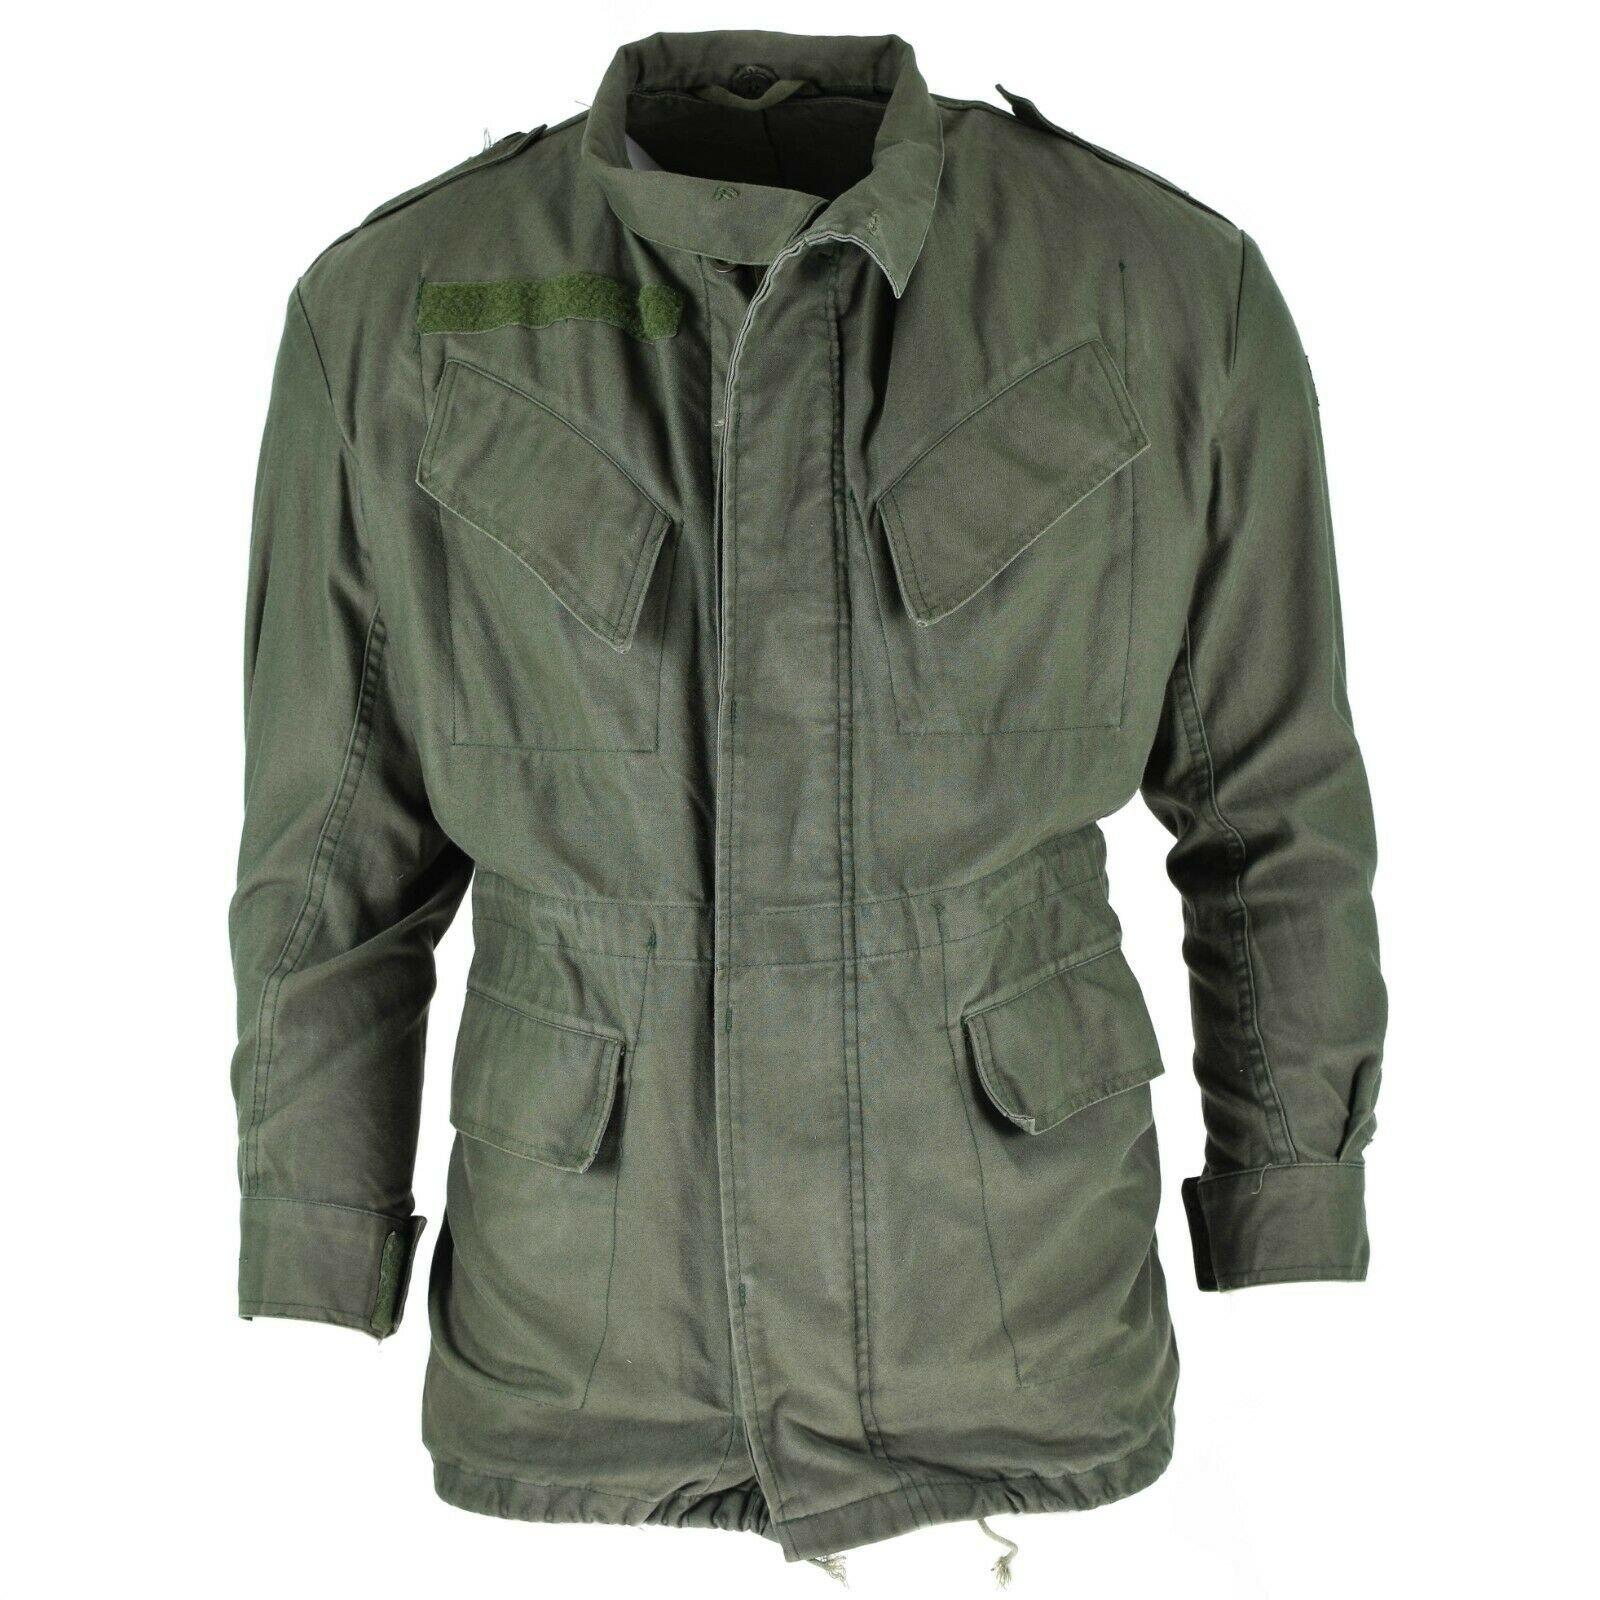 Vintage Belgian army m64 parka jacket military olive khaki cotton coat field